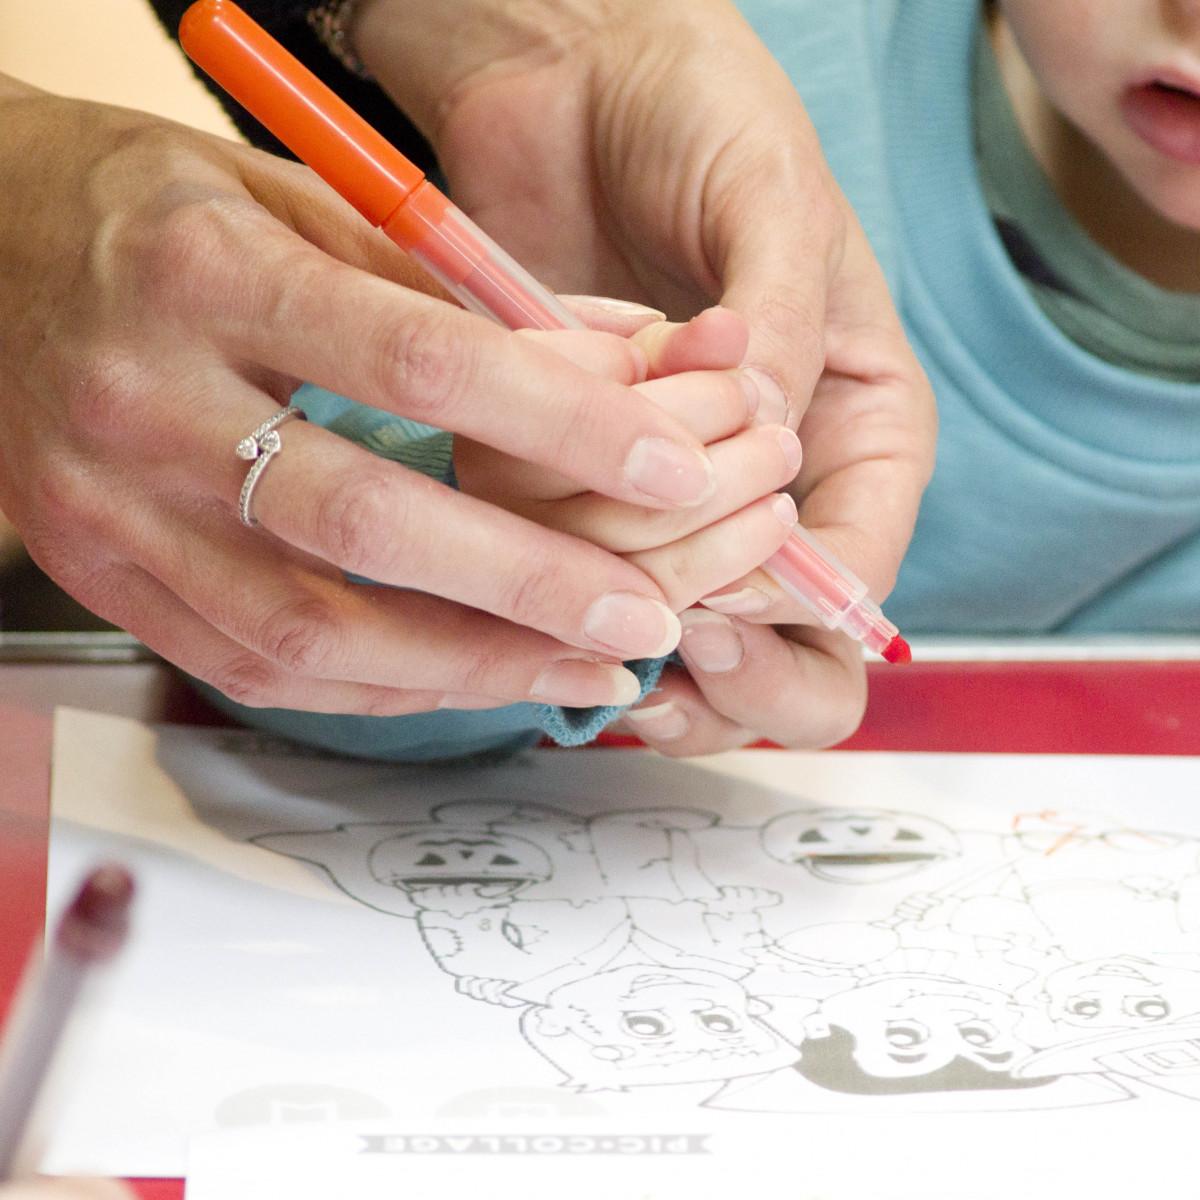 One-to-one-time-Sandra-Sergeant-Schools-Nursery-Photographer-Basingstoke